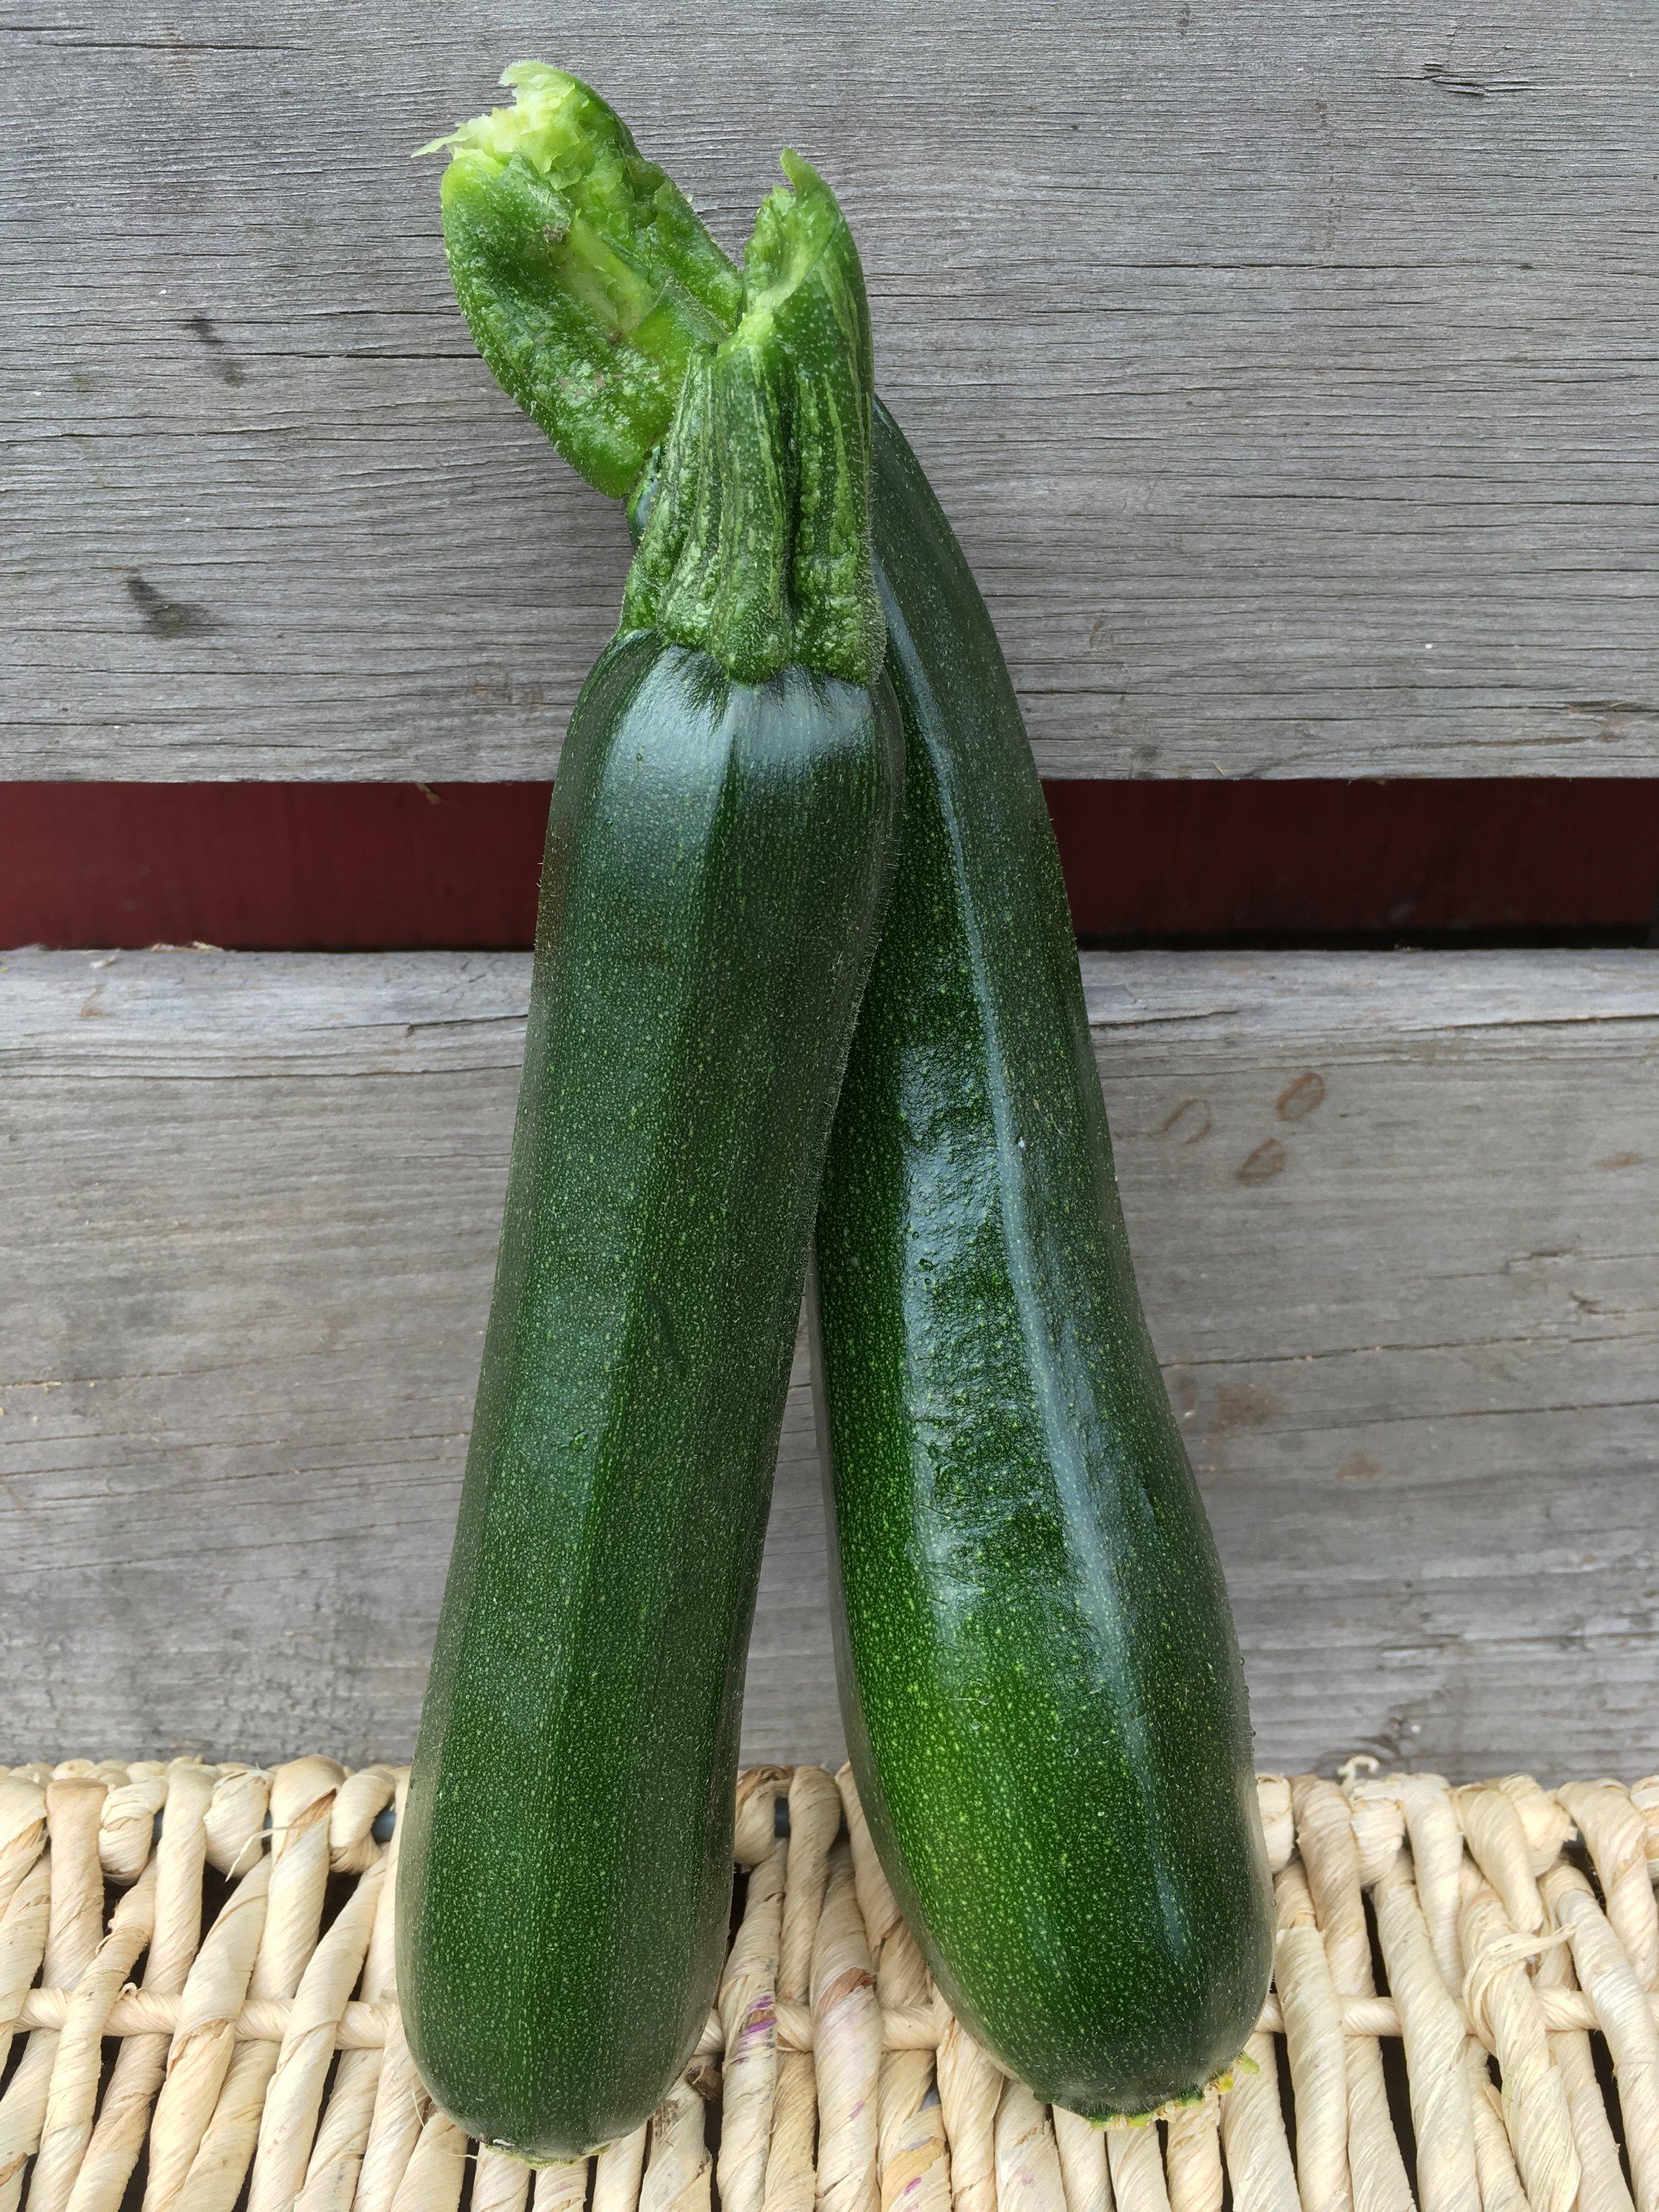 Summer squash / zucchini